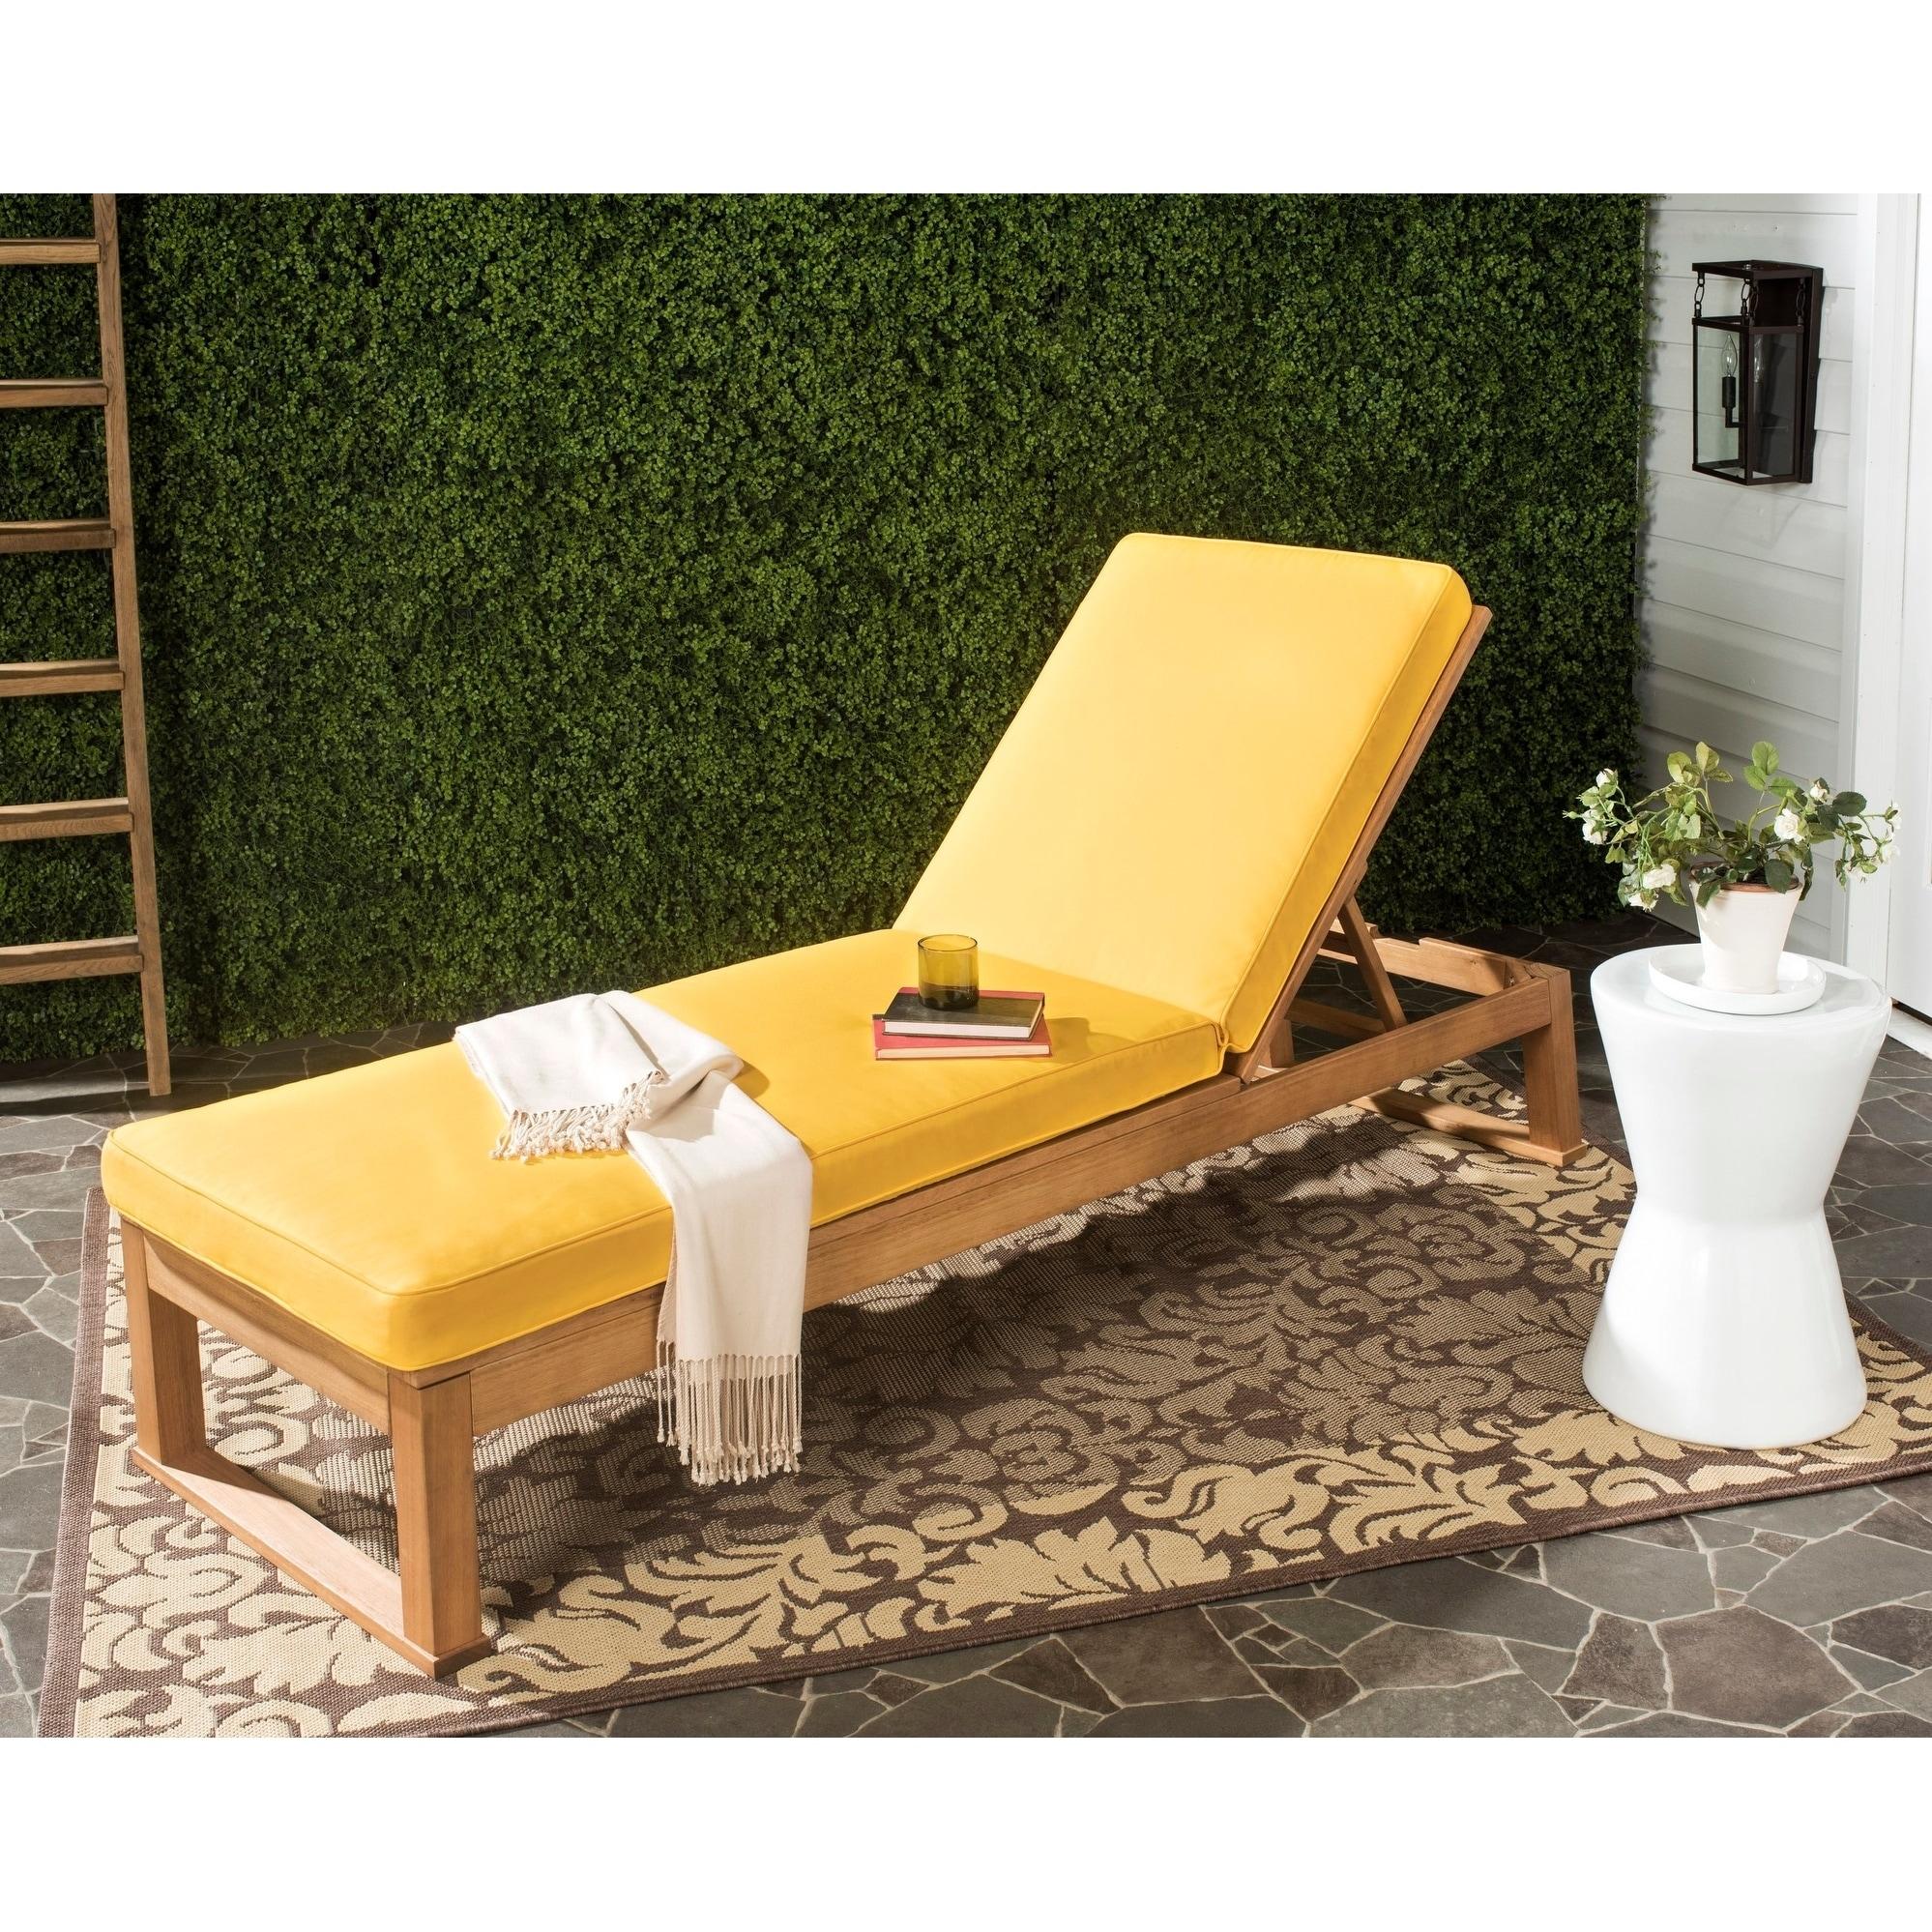 Safavieh Solano Outdoor Teak Brown/ Yellow Sunlounger (PA...